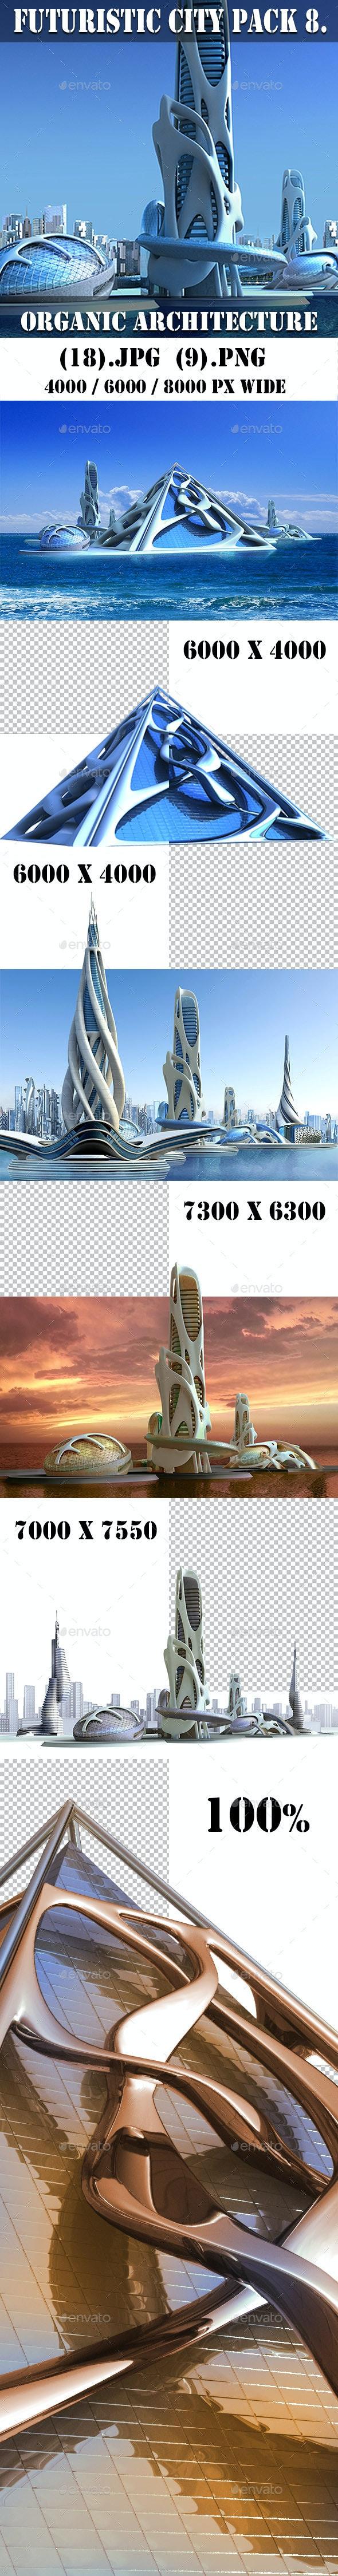 Futuristic City Pack 8. Organic Architecture - Architecture 3D Renders